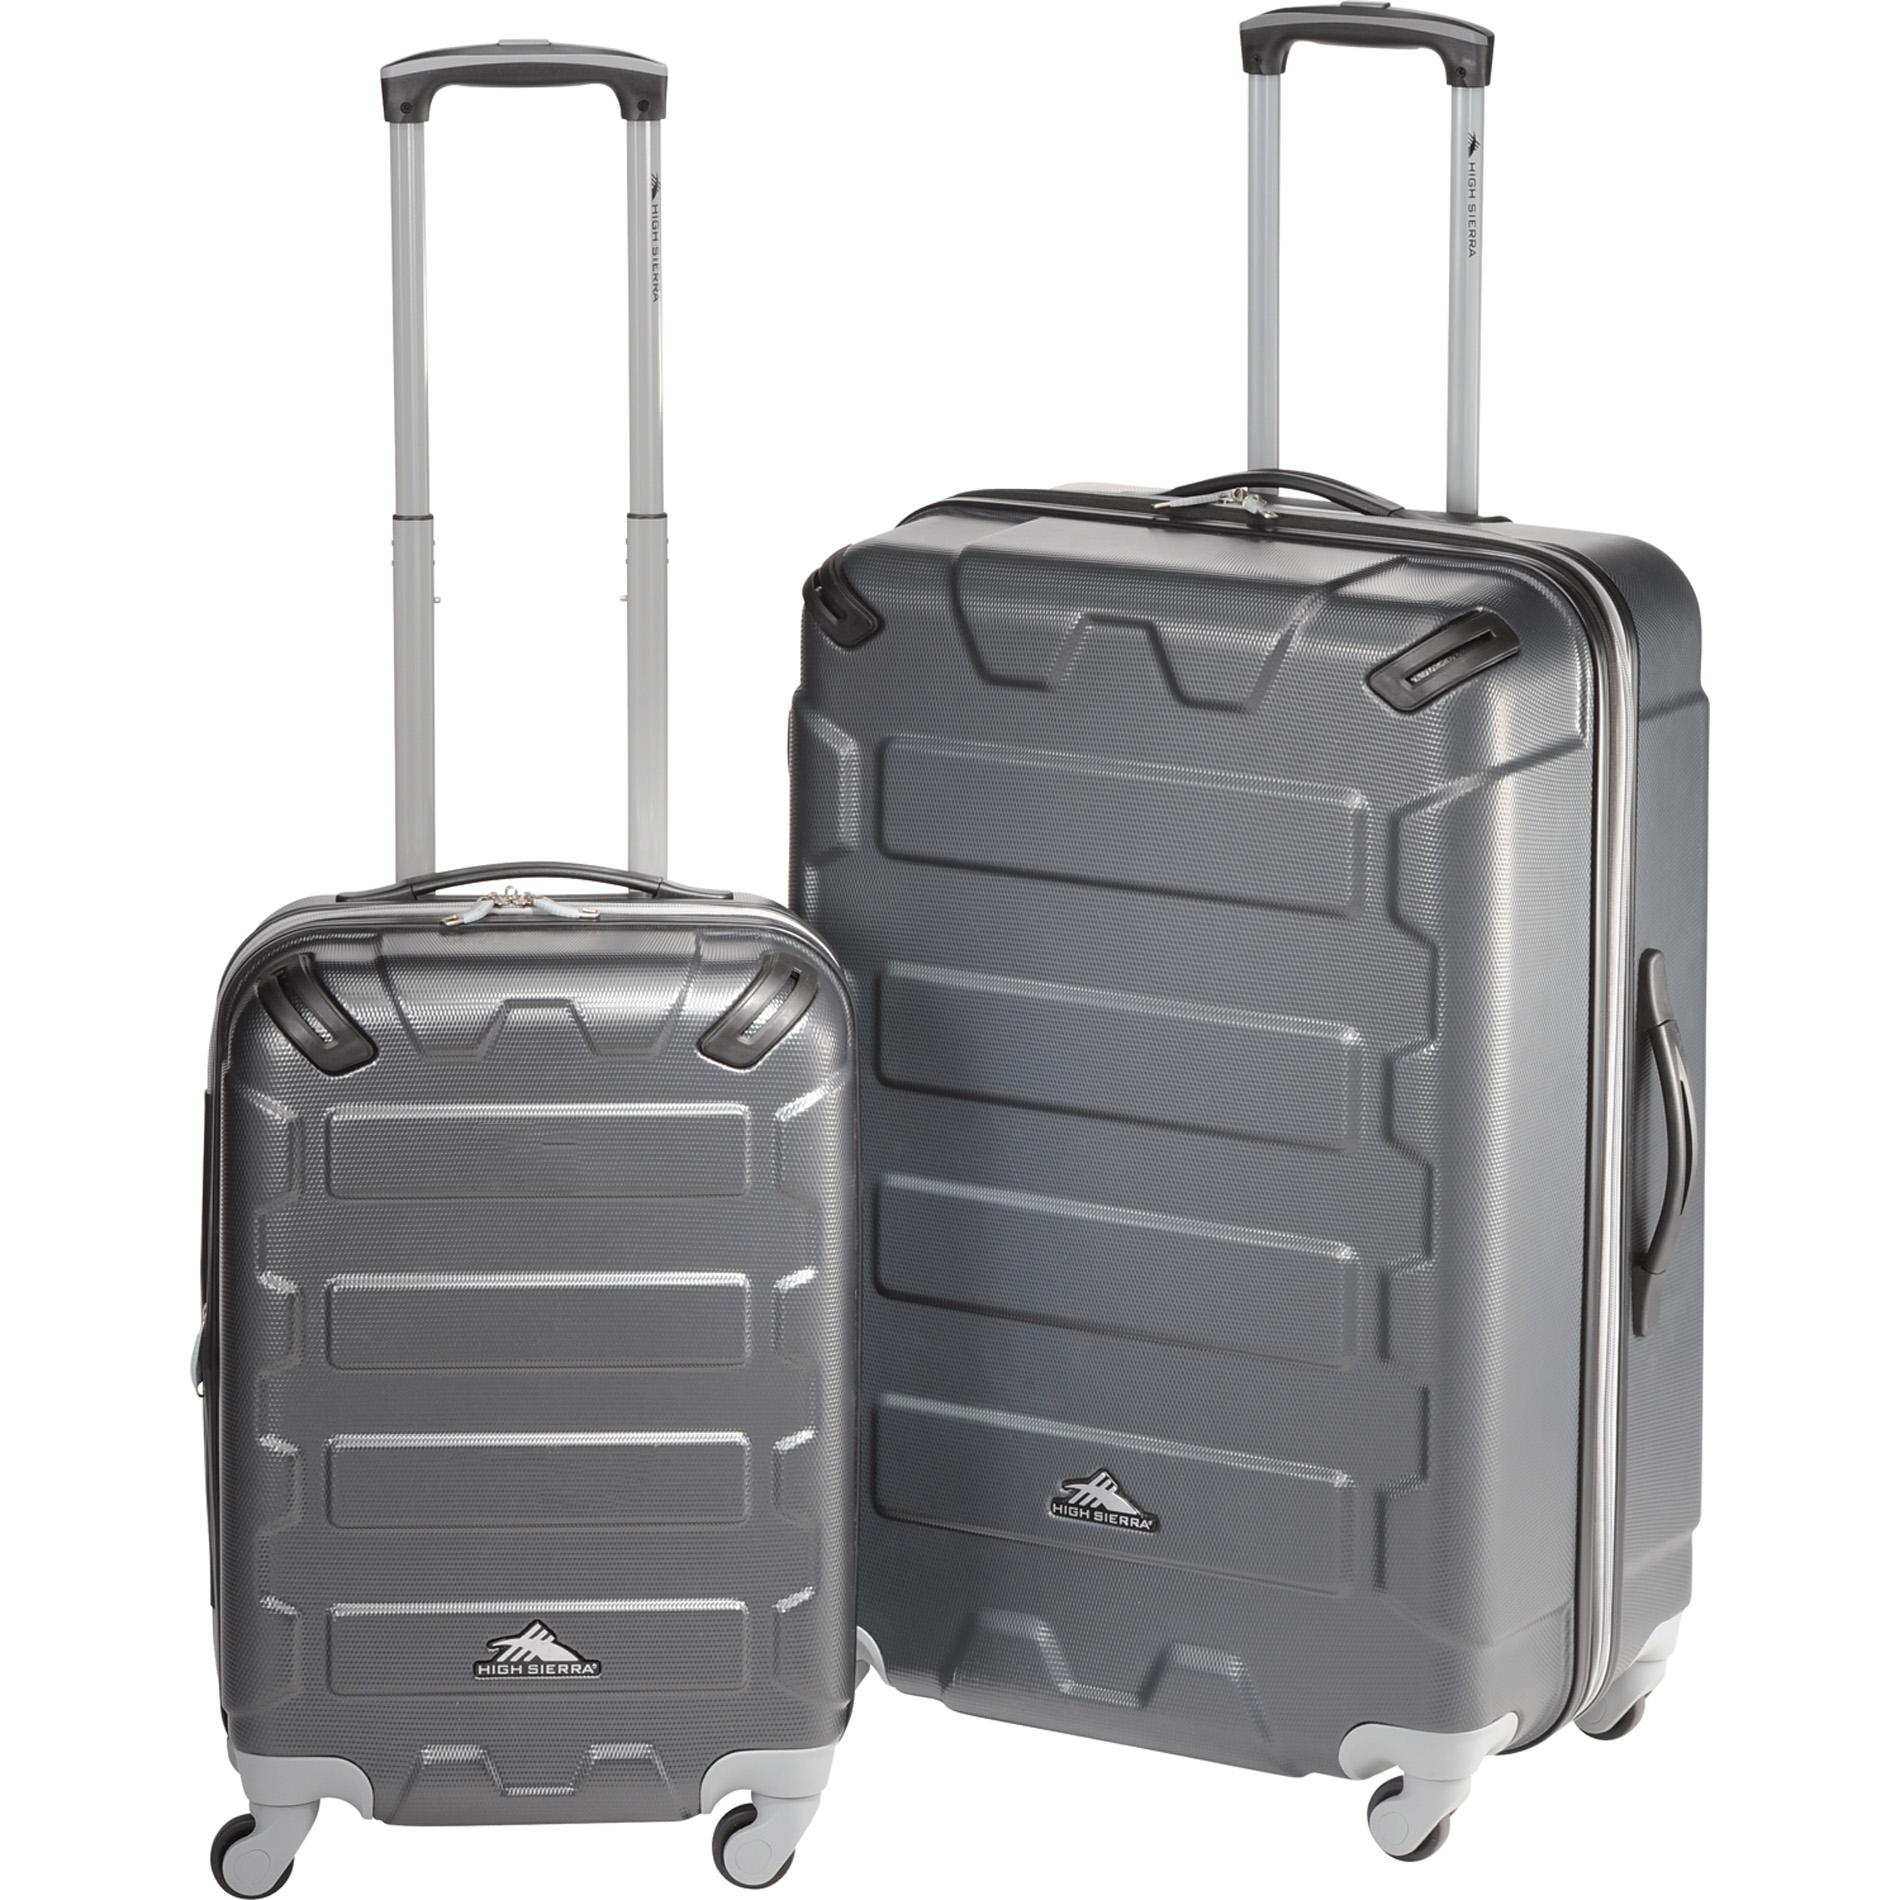 High Sierra 8053-02 - 2pc Hardside Luggage Set